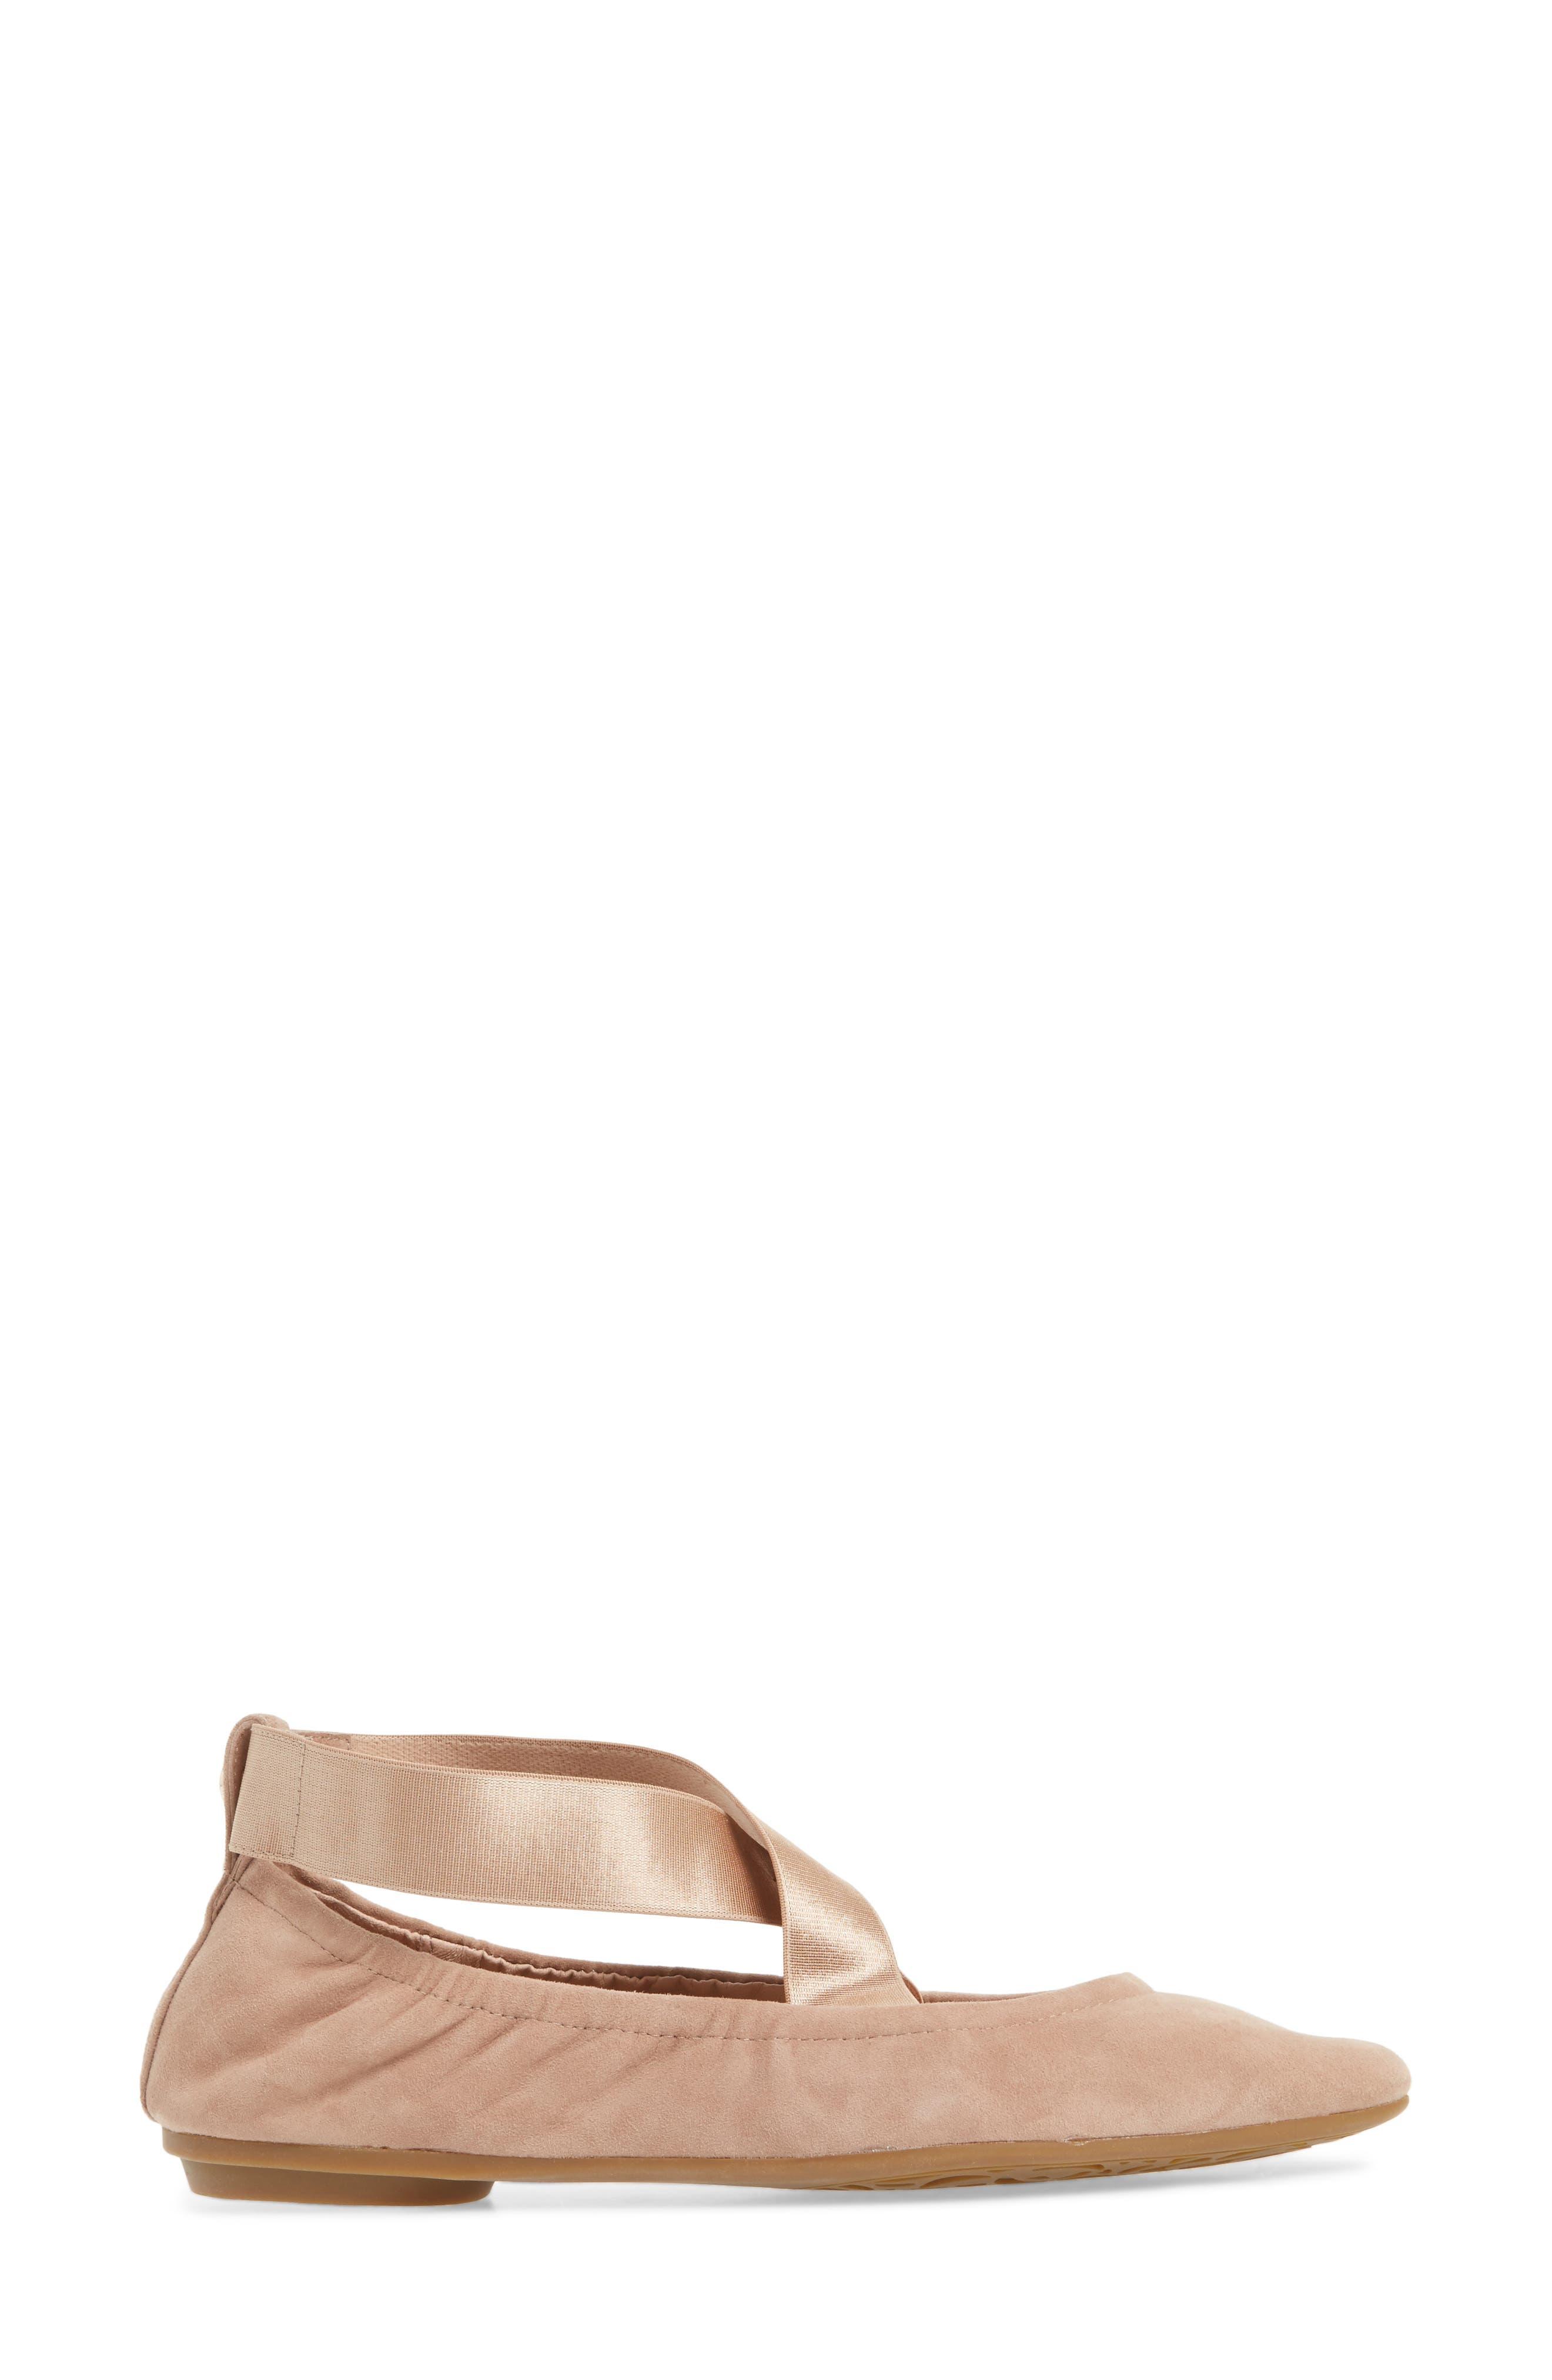 Edina Strappy Ballet Flat,                             Alternate thumbnail 3, color,                             Soft Beige Suede